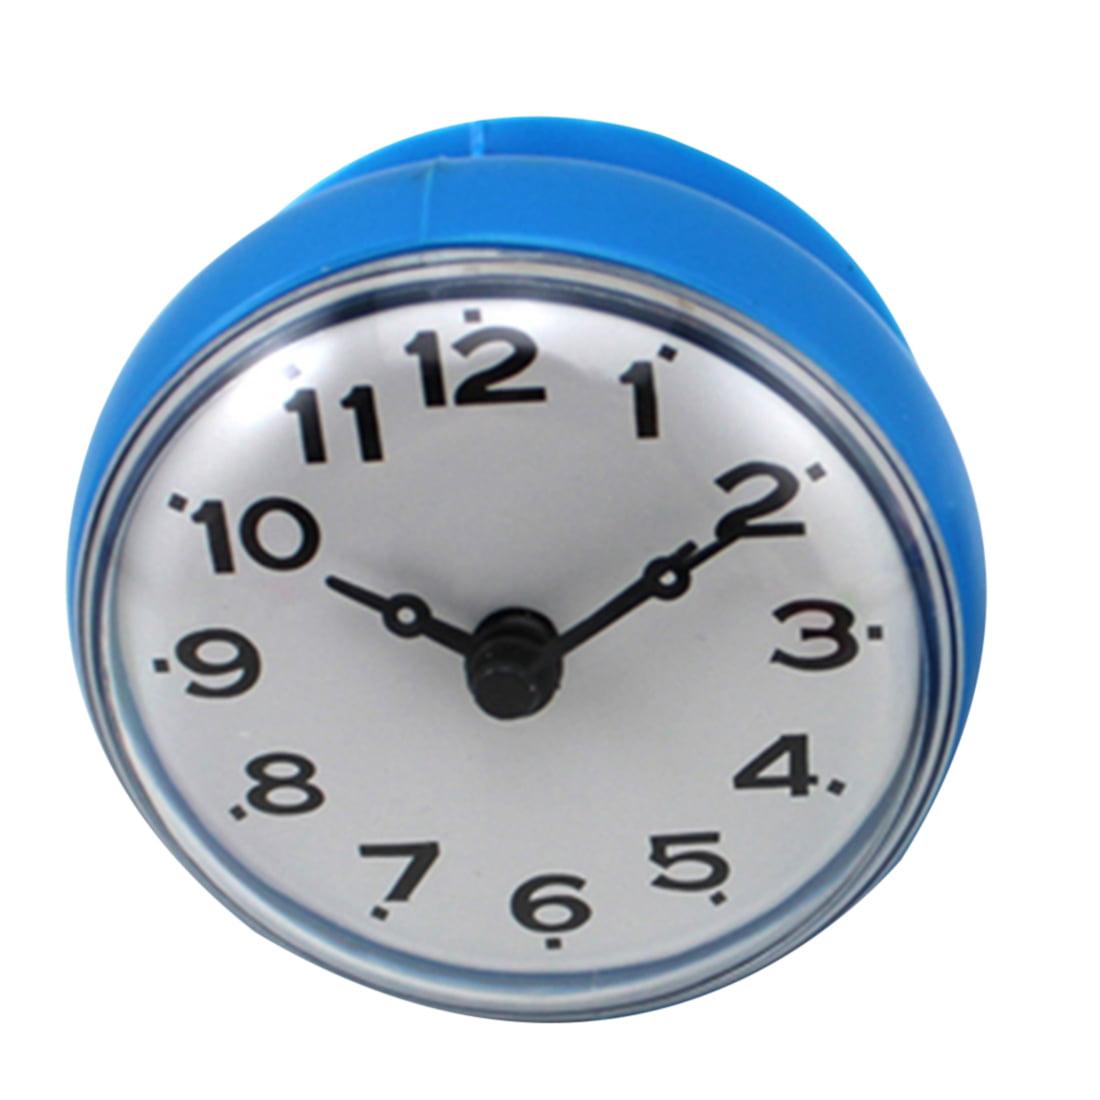 Adsorption wall clock Home Bathroom Kitchen Adsorption Type Waterproof Round Mini Clock... by